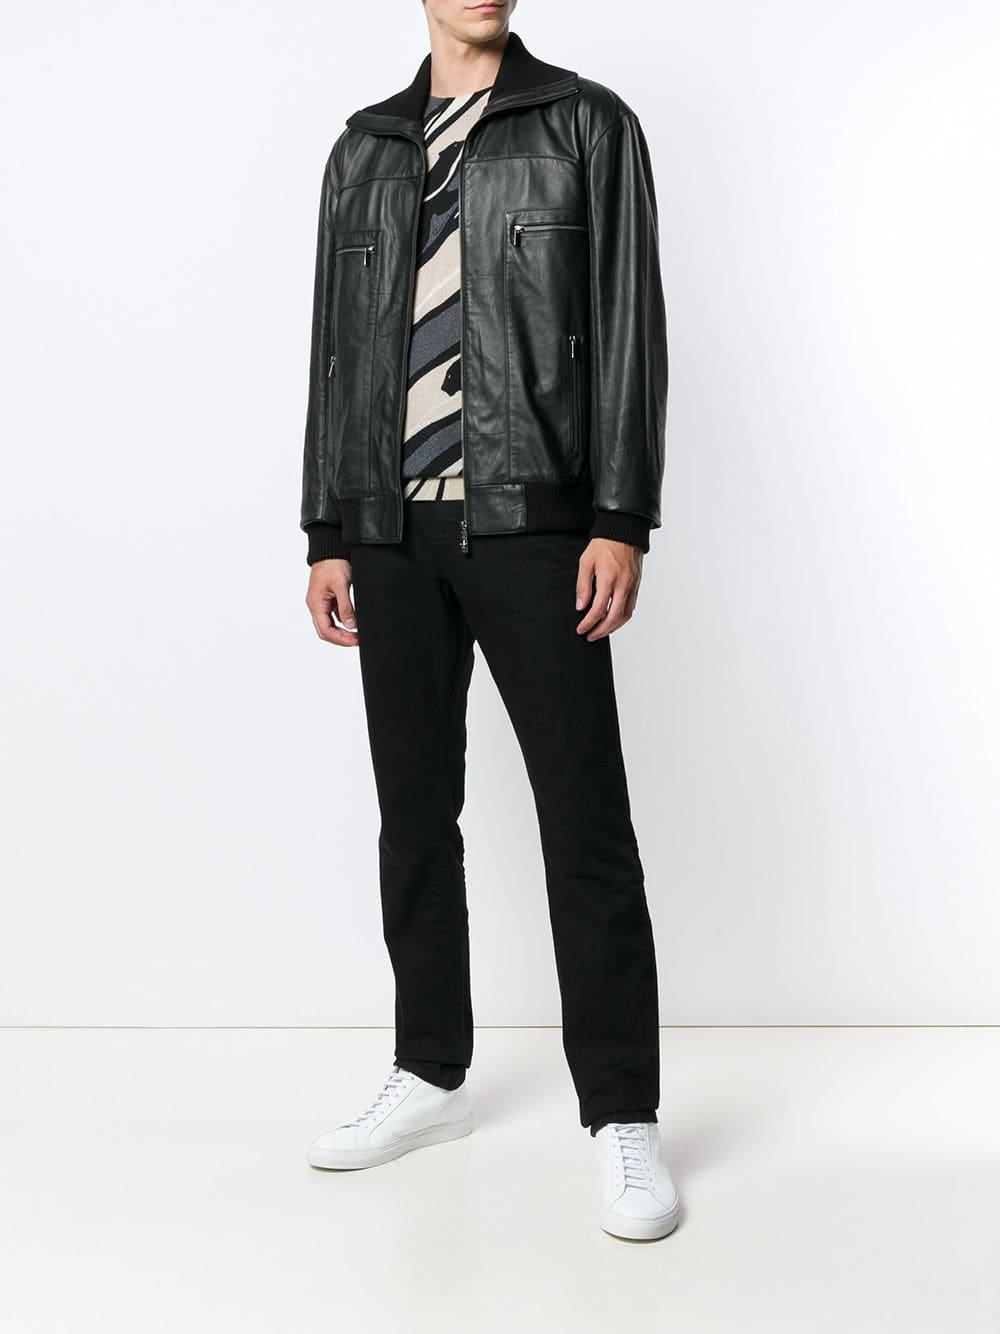 Class Roberto Cavalli - Black Leather Bomber Jacket for Men - Lyst. View  fullscreen 01a0bb6d248